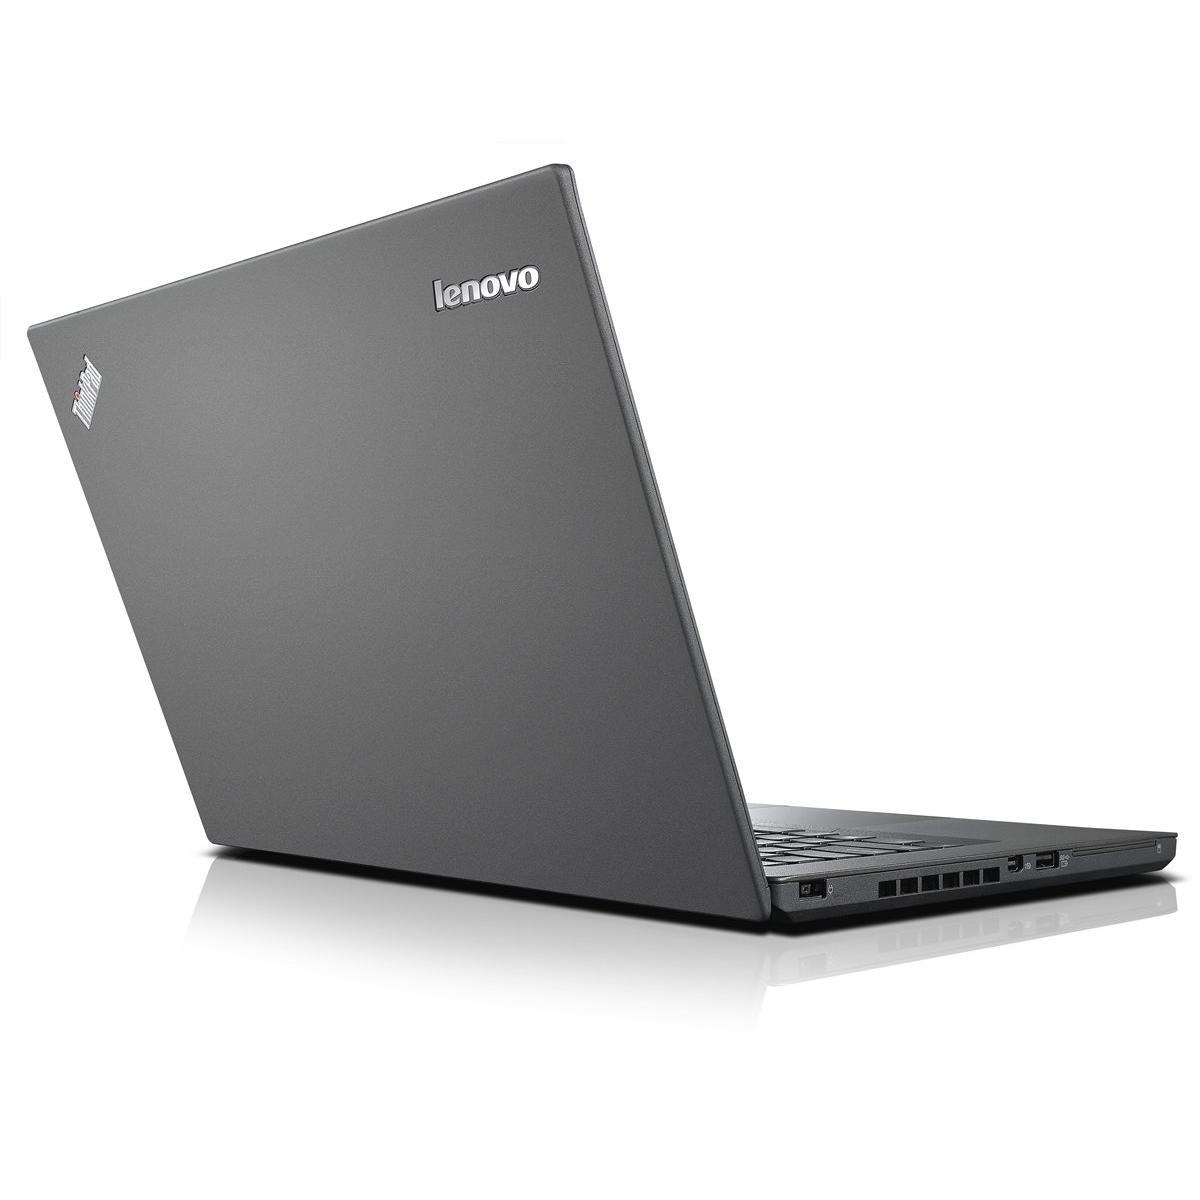 "Lenovo Thinkpad T440 14"" (2013) - Core i5-4300U - 8GB - SSD 256 GB AZERTY - Francúzska"